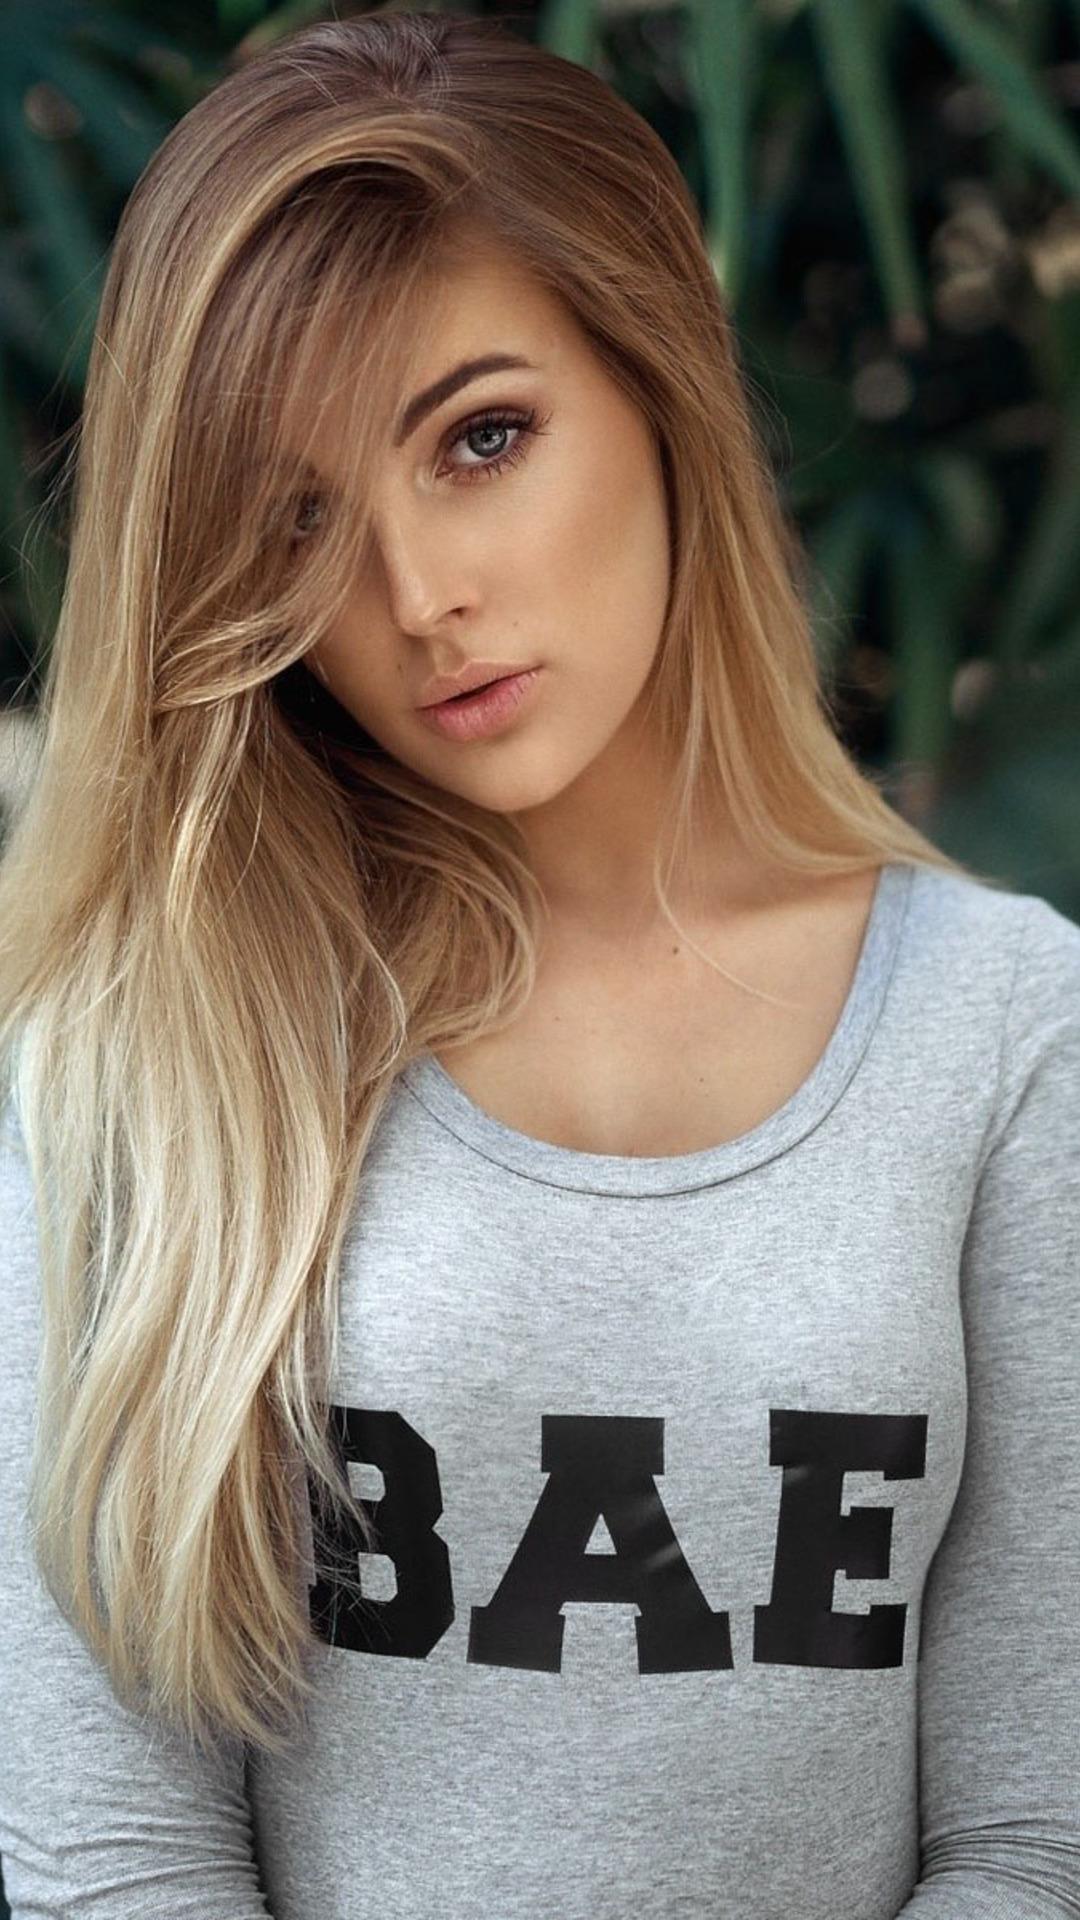 Cute Girl Hd Wallpaper Indian 1080x1920 Girl With Bae Shirt Iphone 7 6s 6 Plus Pixel Xl